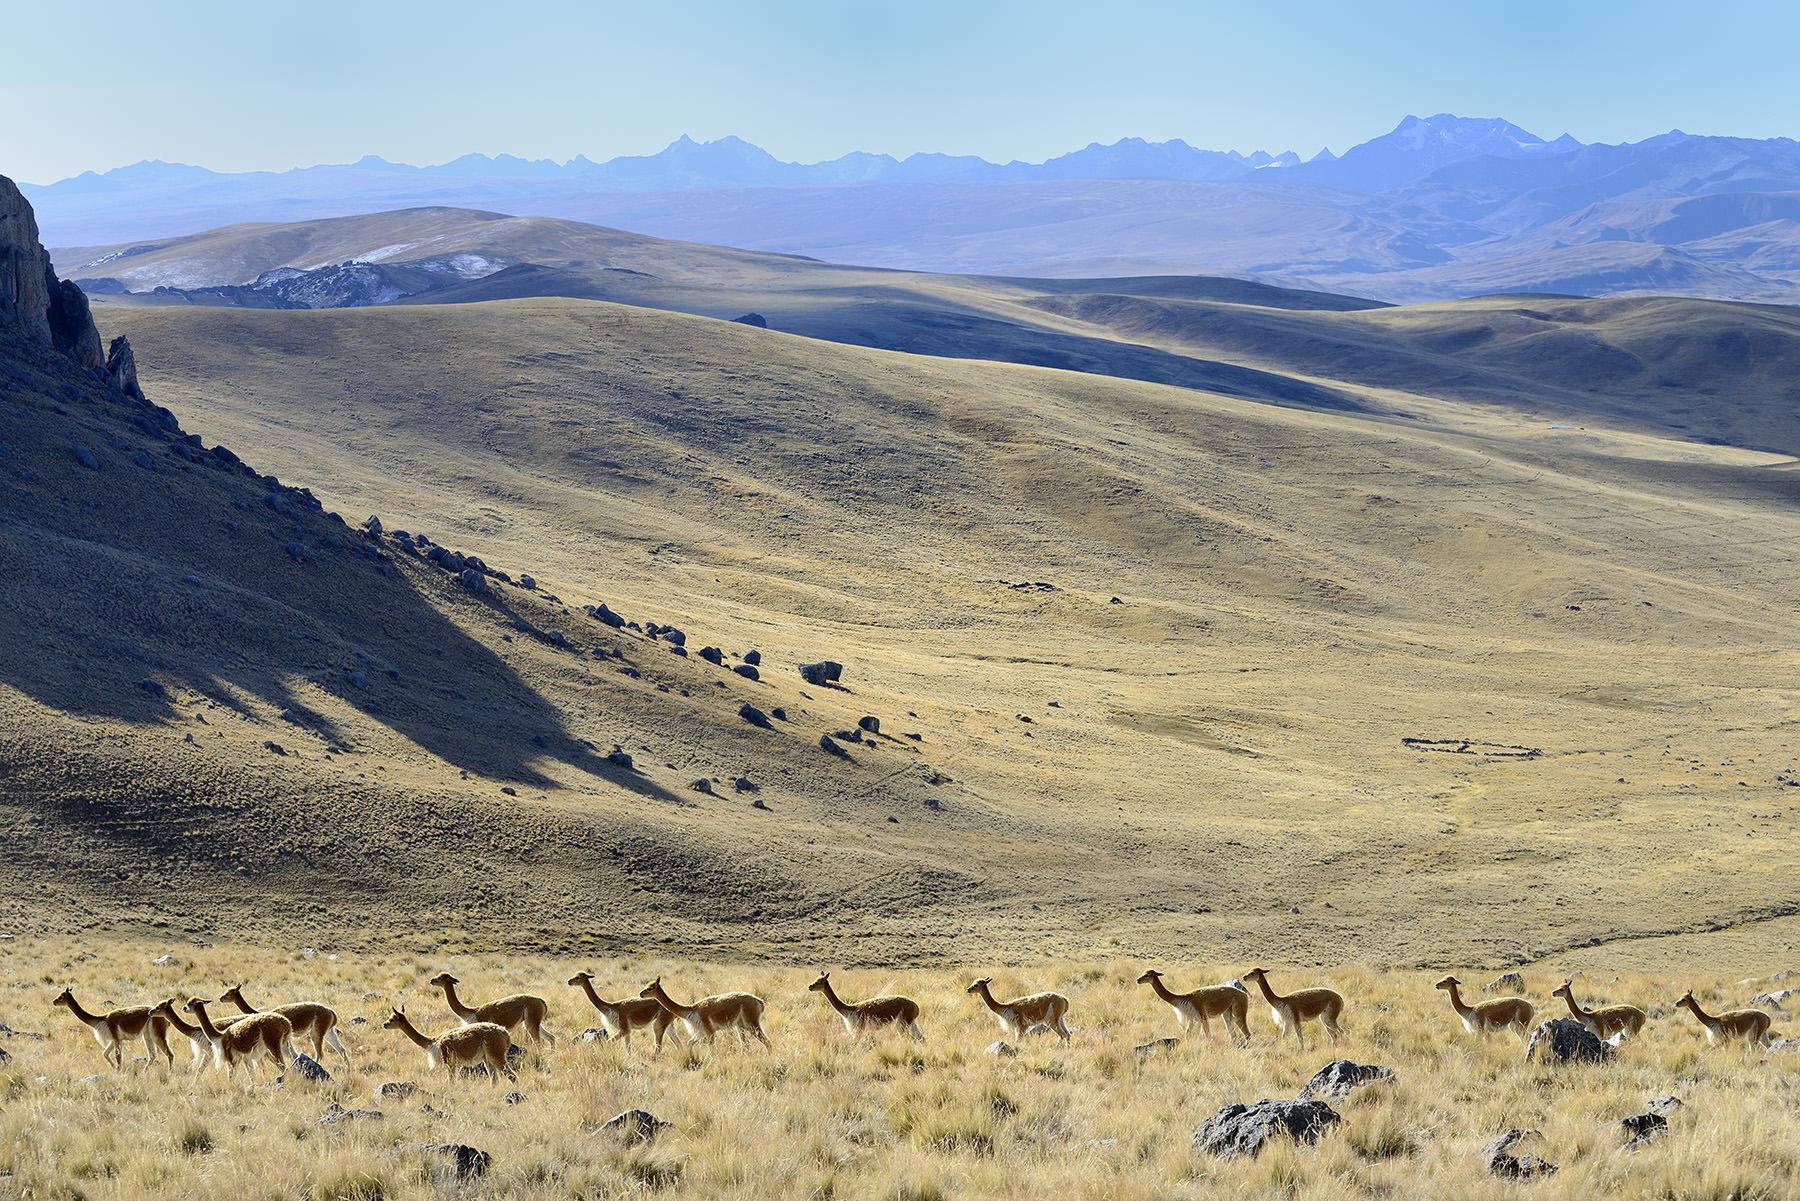 Peru, region of Puno (Titicaca), province of San Antonio De Putina. Community of Picotani (includes 3 villages Picotani, Toma and Cambria). Vicuna (Vicugna, Vigogne).